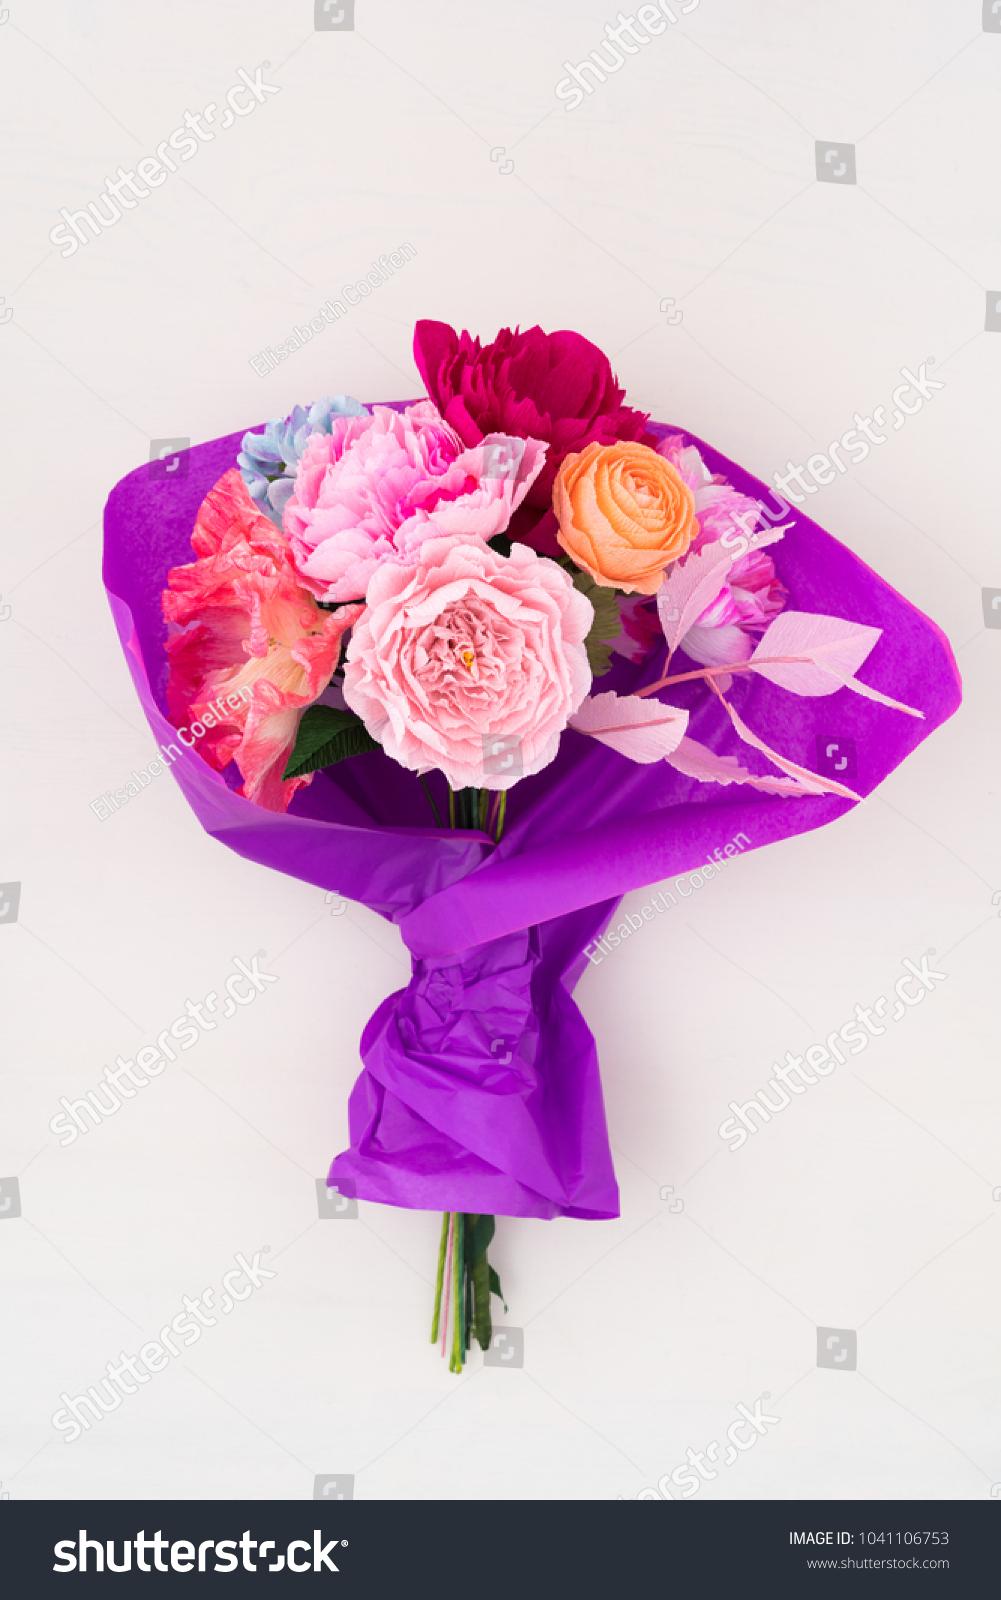 Crepe paper flower bouquet peonies sweet stock photo edit now crepe paper flower bouquet with peonies sweet peas poppies ranunculus roses and izmirmasajfo